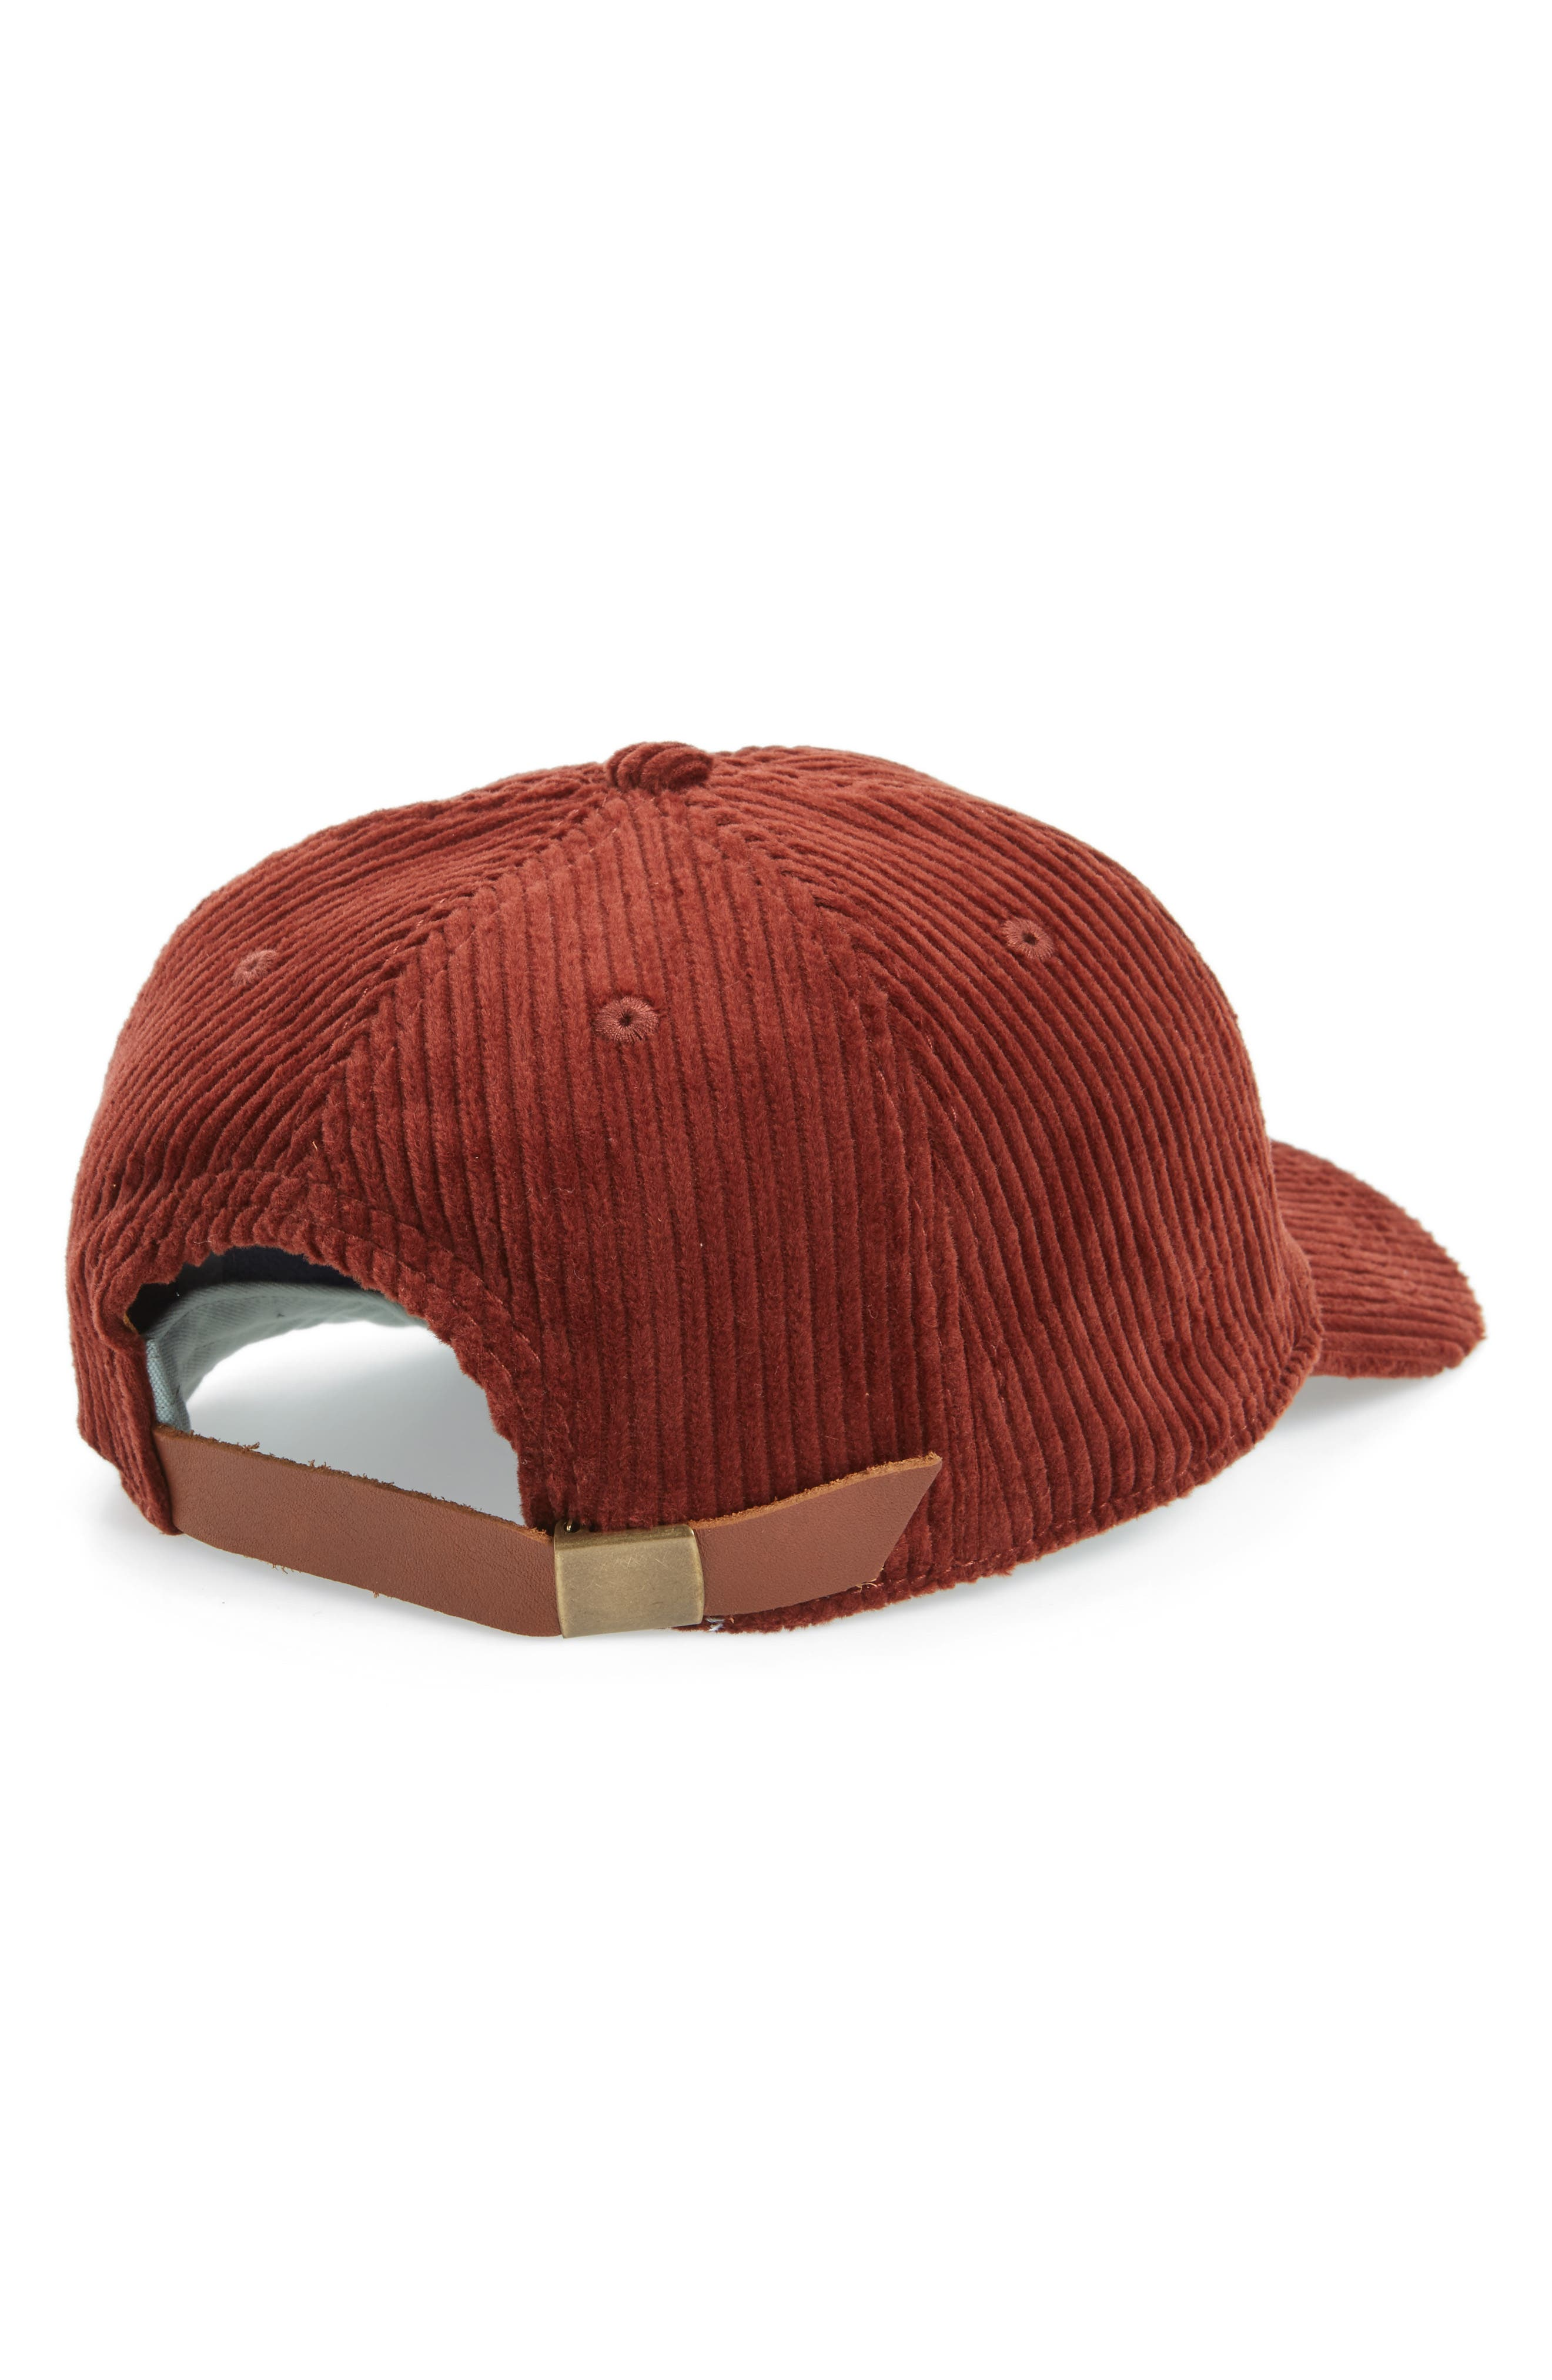 Corduroy Baseball Cap,                             Alternate thumbnail 2, color,                             930